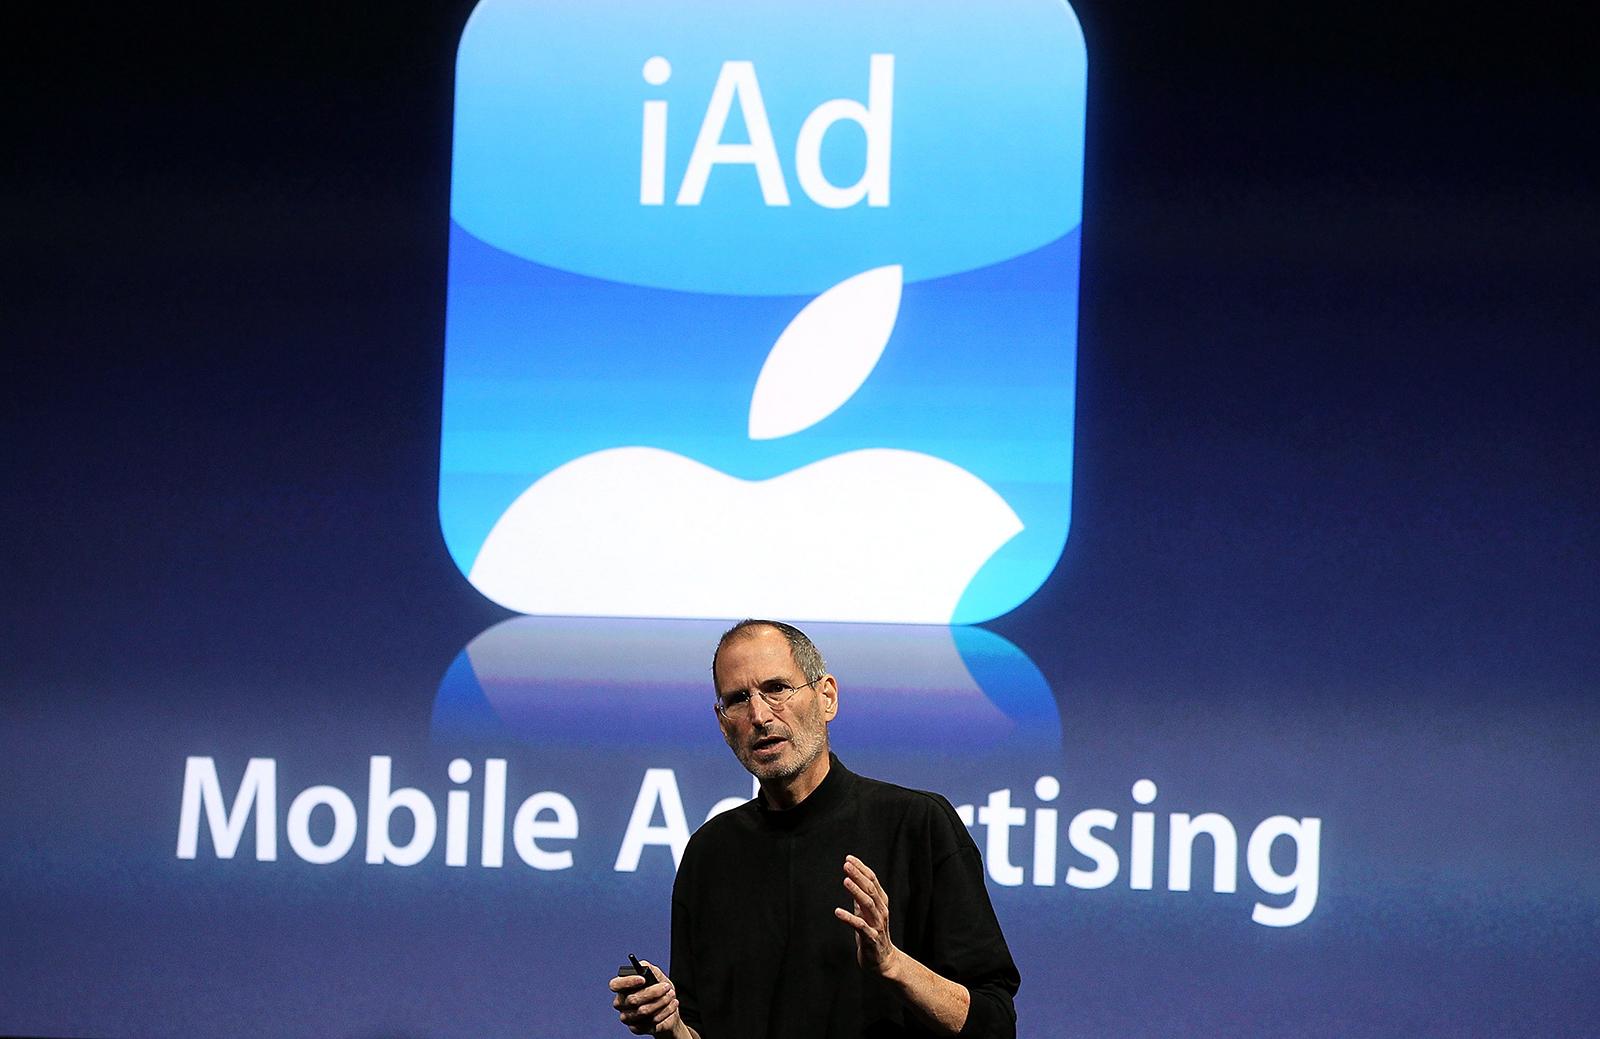 Steve Jobs apresentando o iAd